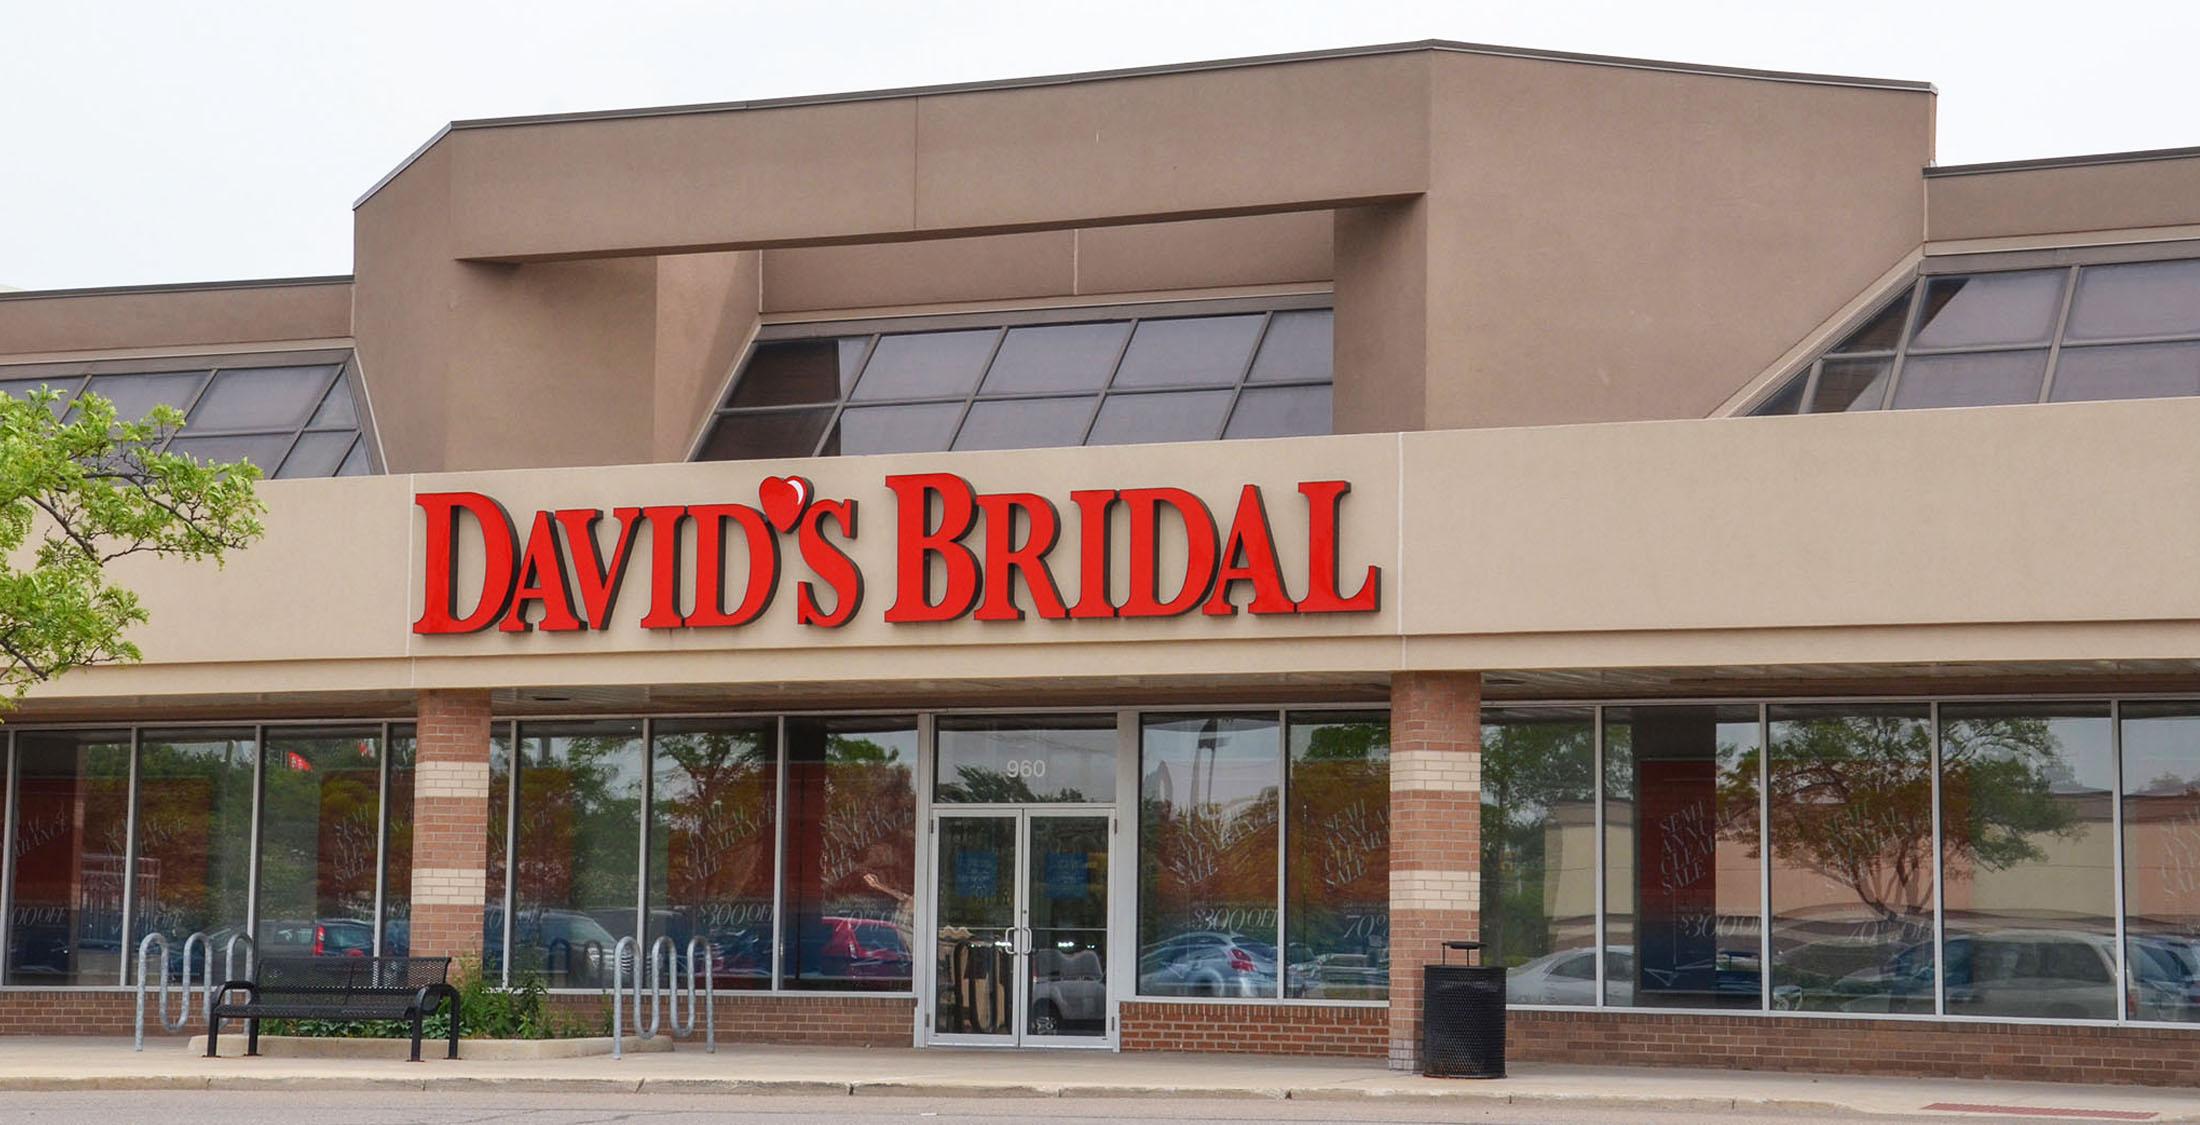 David's Bridal store